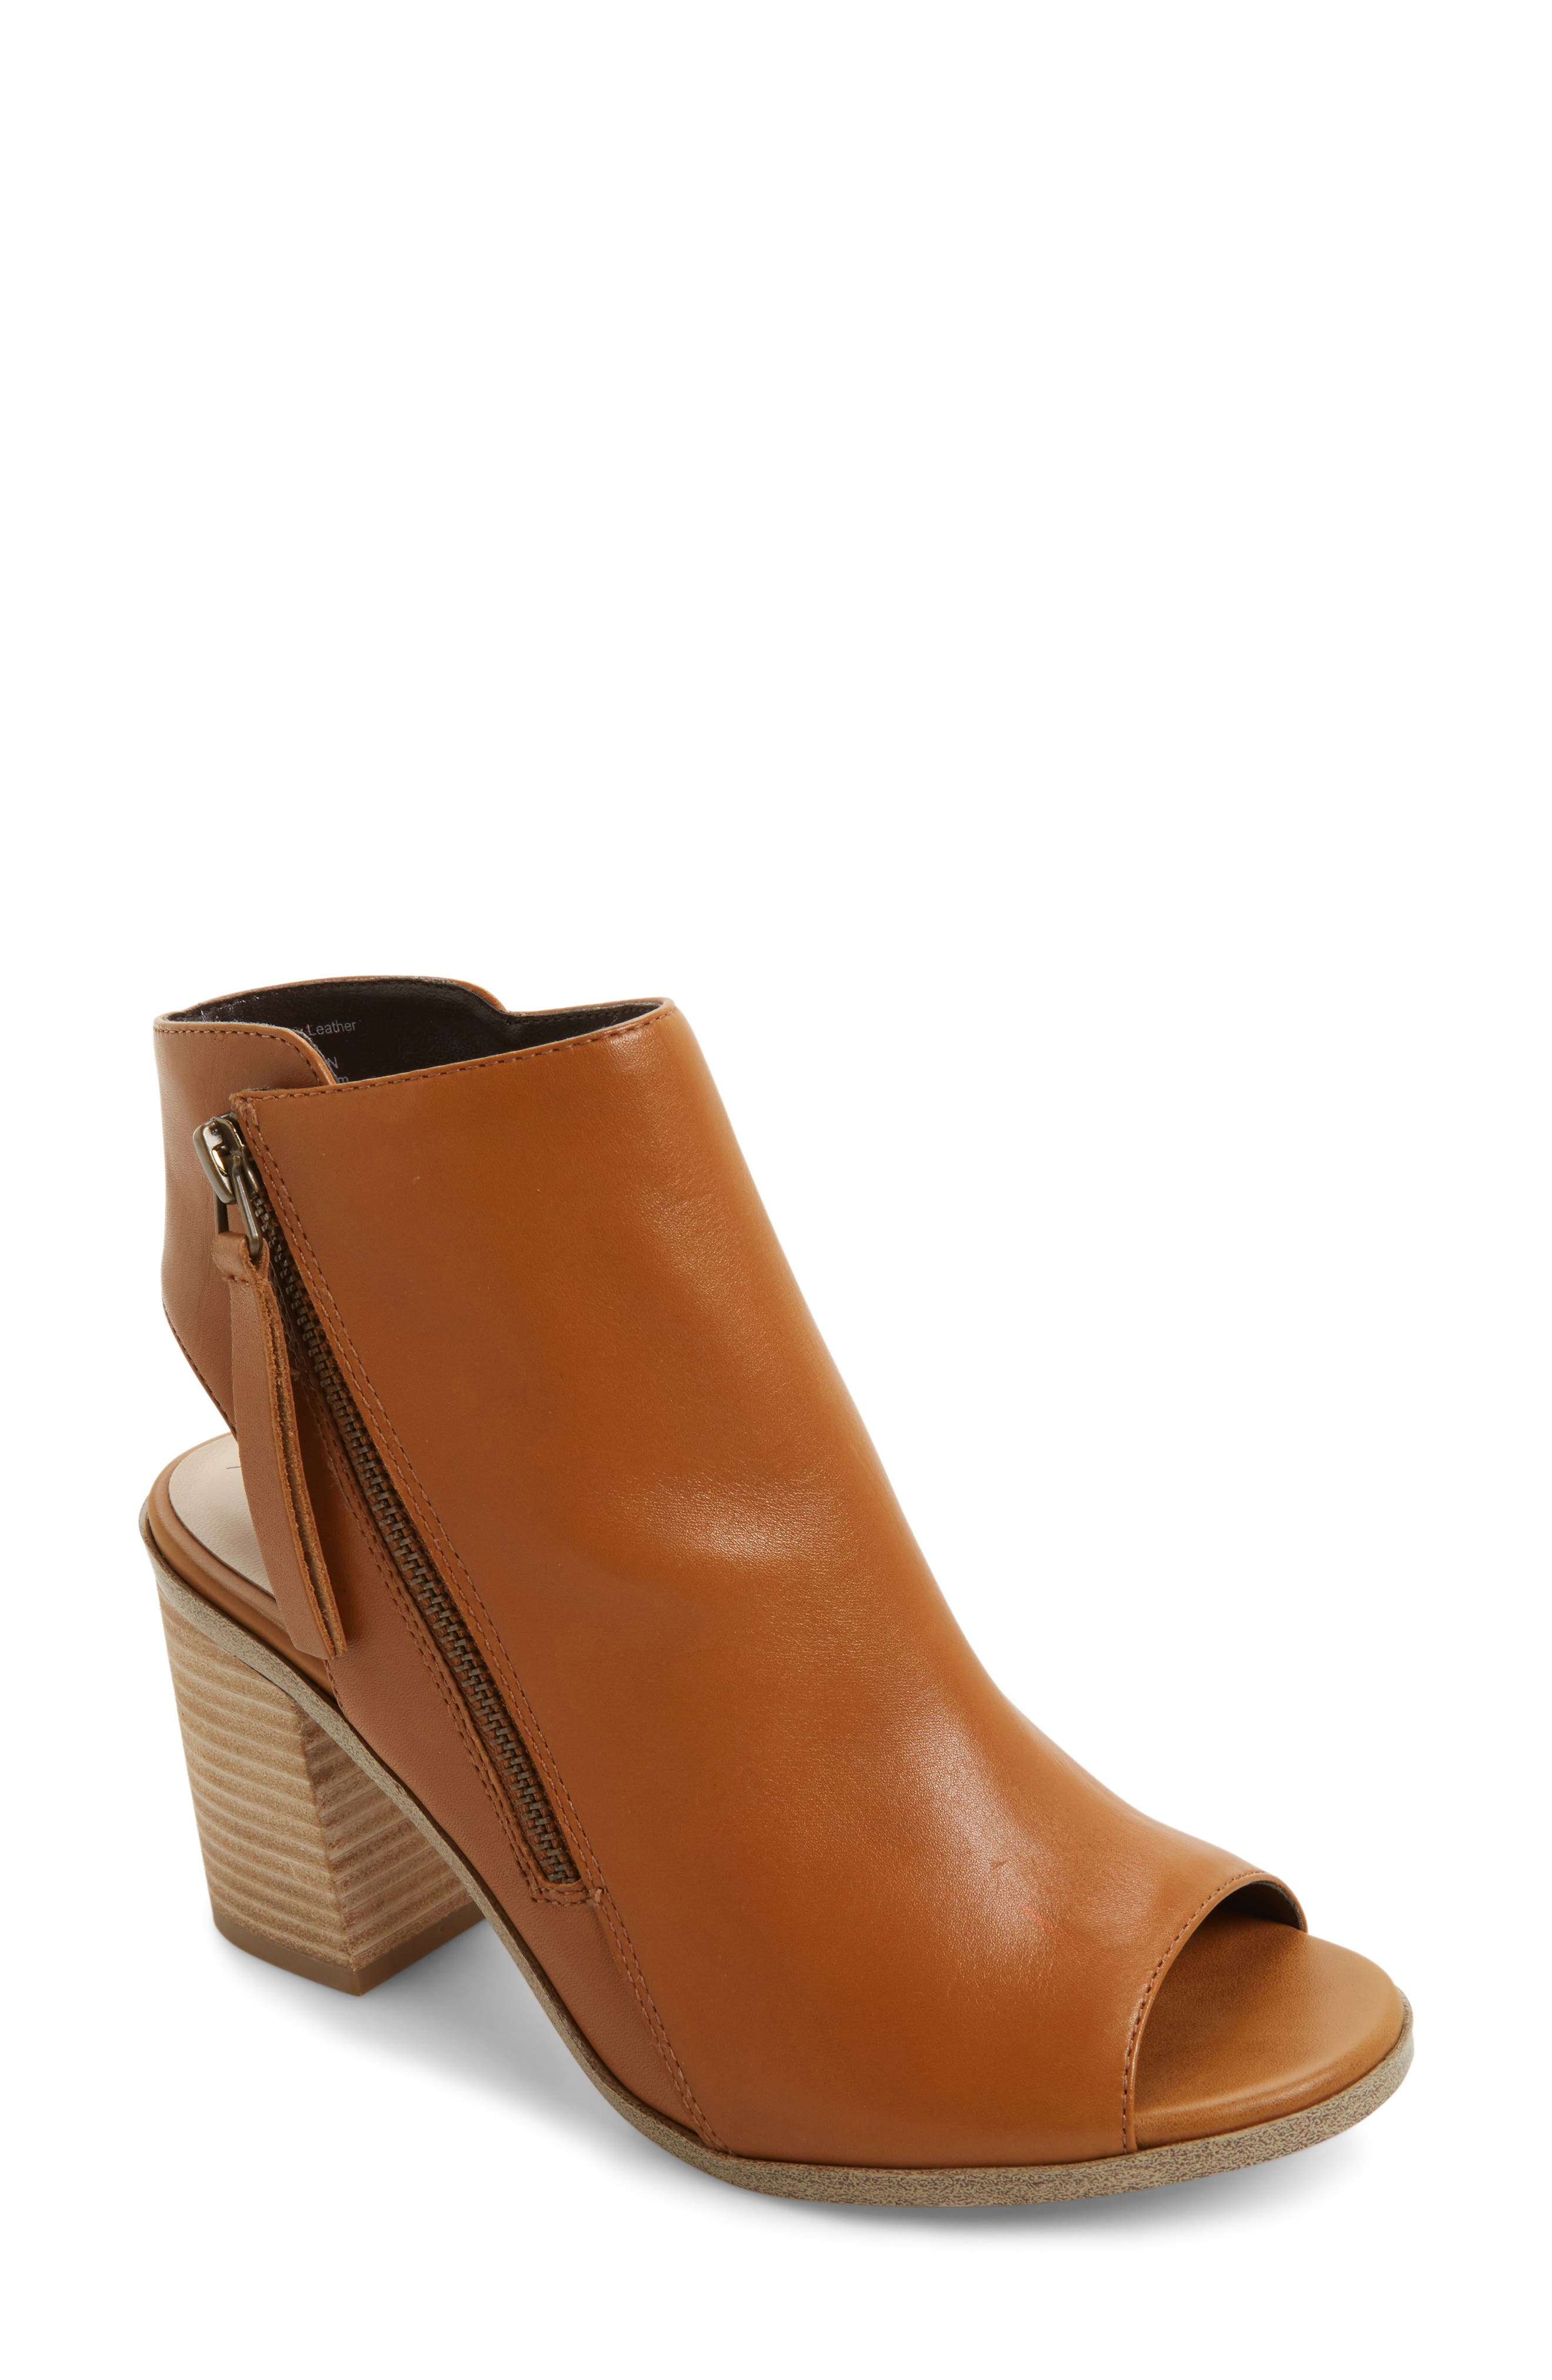 Main Image - Sole Society Arizona Block Heel Peep-Toe Bootie (Women)